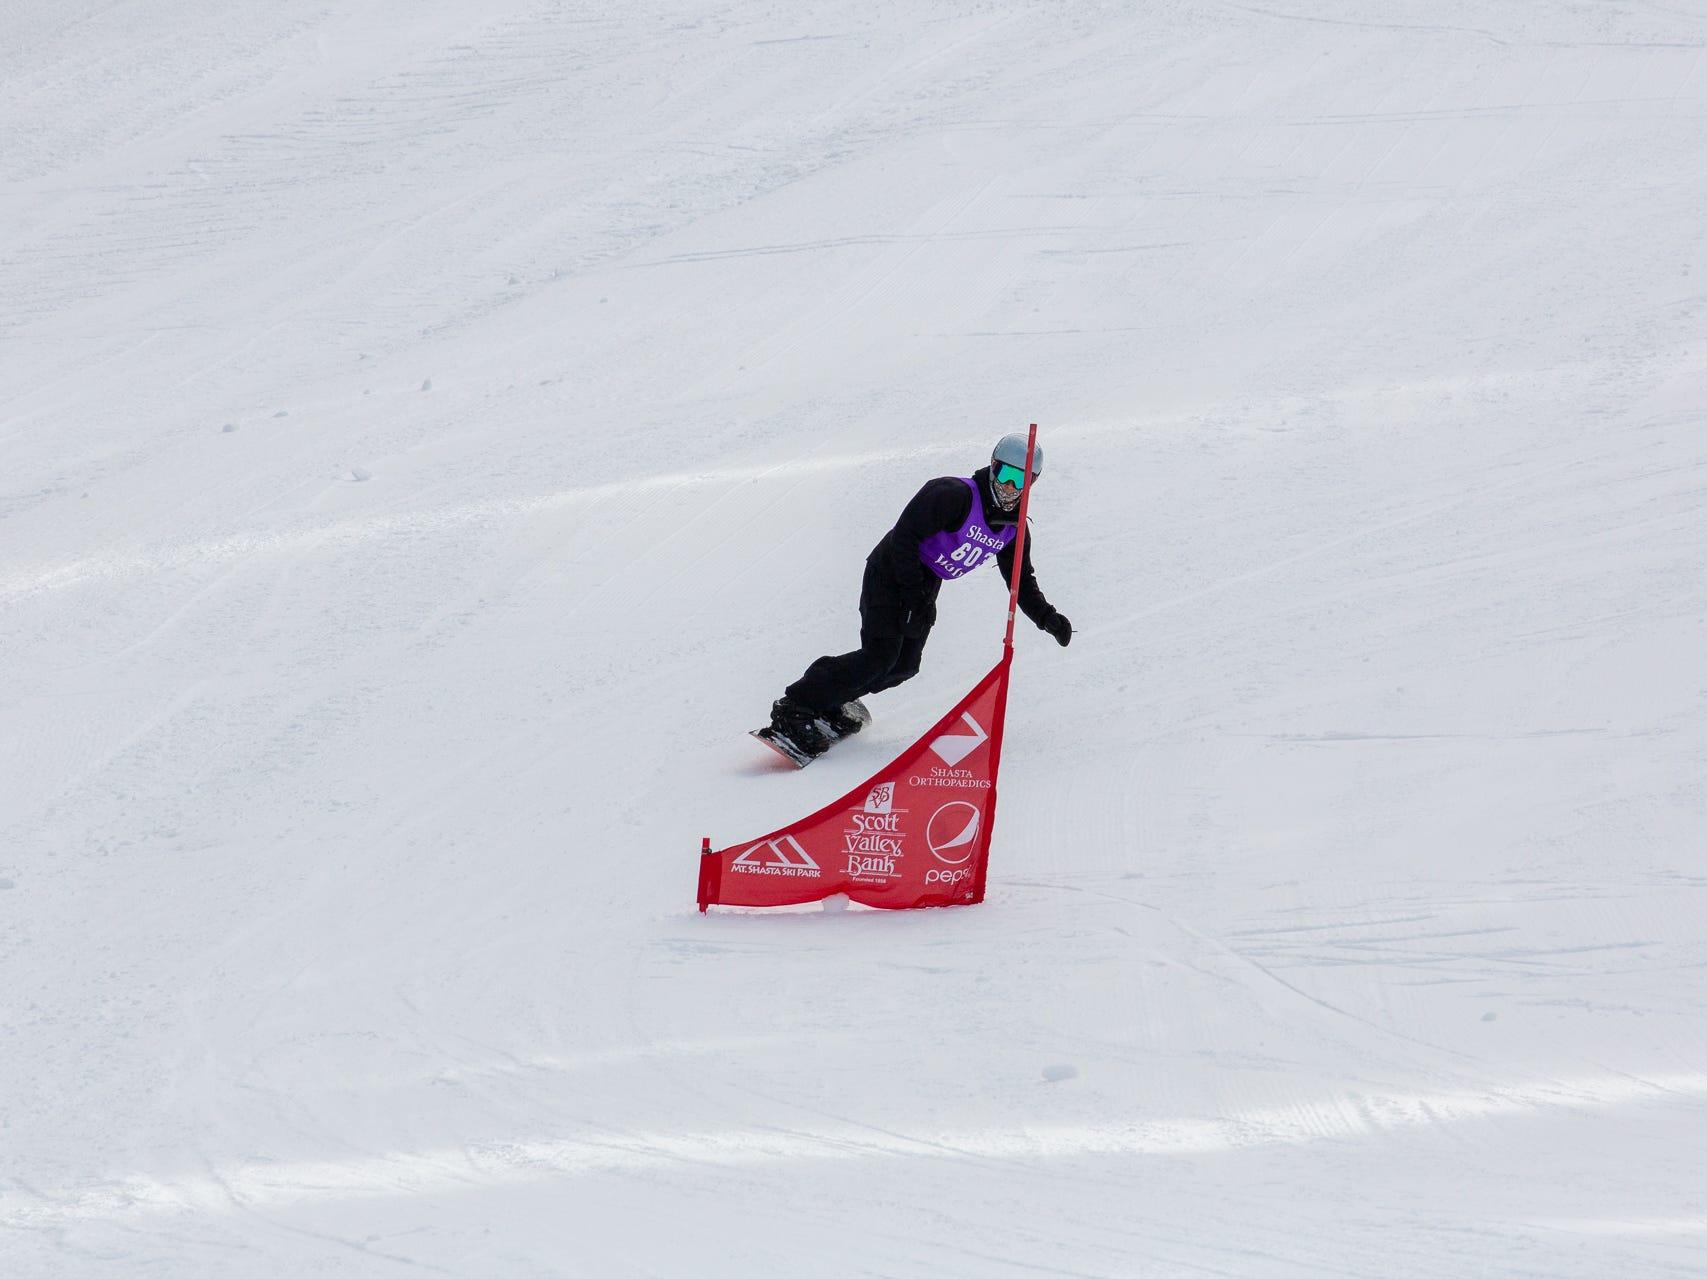 Gabe Rubanowitz of Shasta competes in the second high school snowboard meet of 2019 on Monday, Jan. 21 at Mt. Shasta Ski Park.